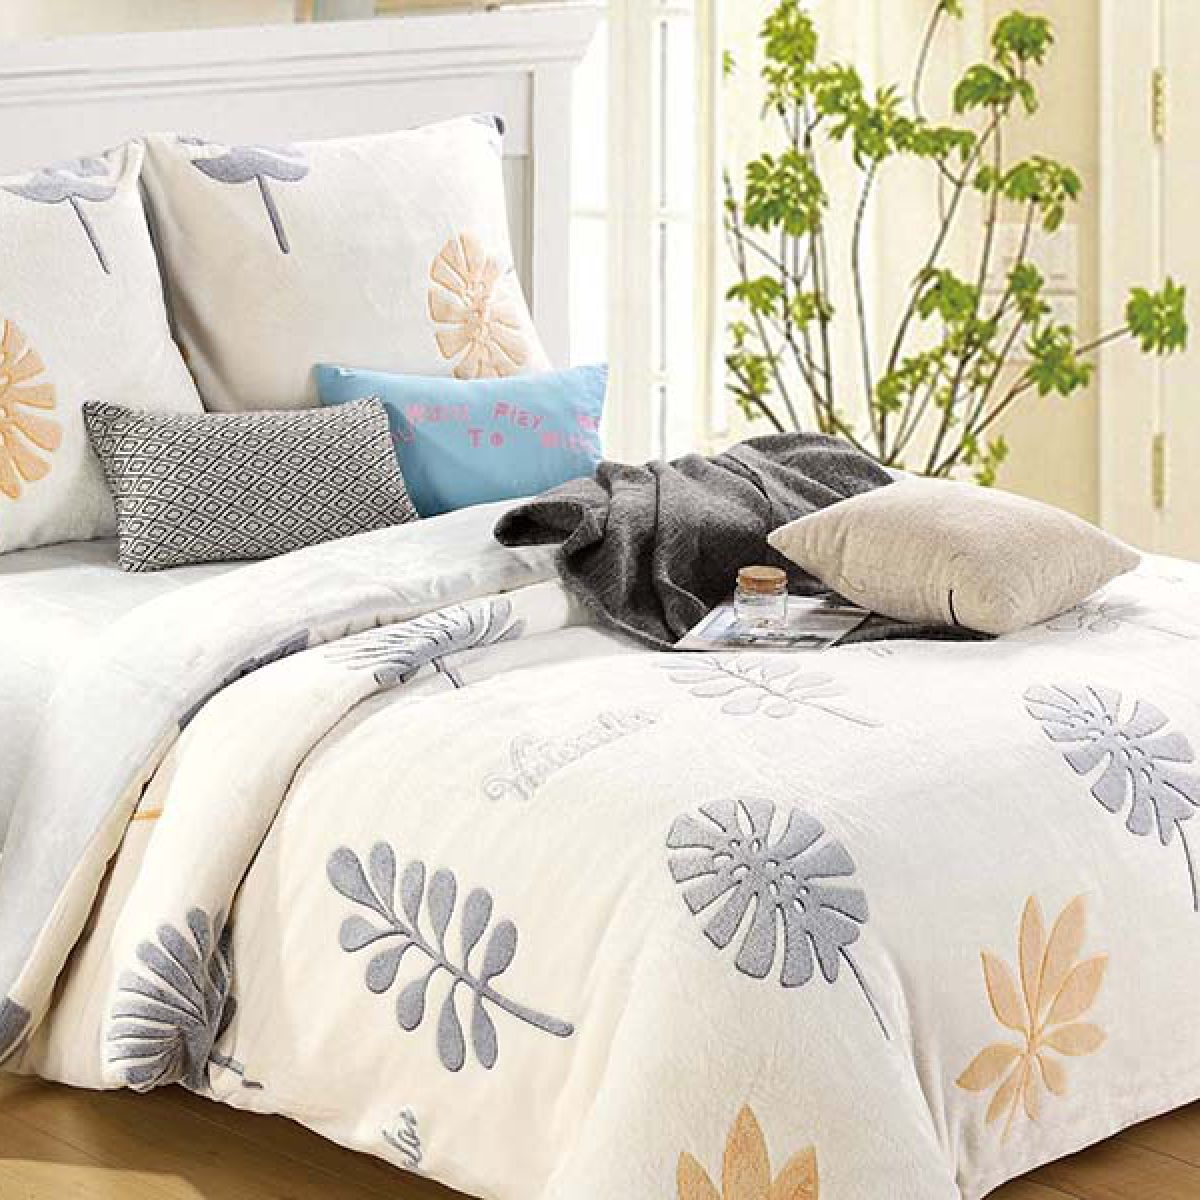 Plush Beddings - Cotton World - SHK-5201 - 220x200 cm - 3 pcs (1)